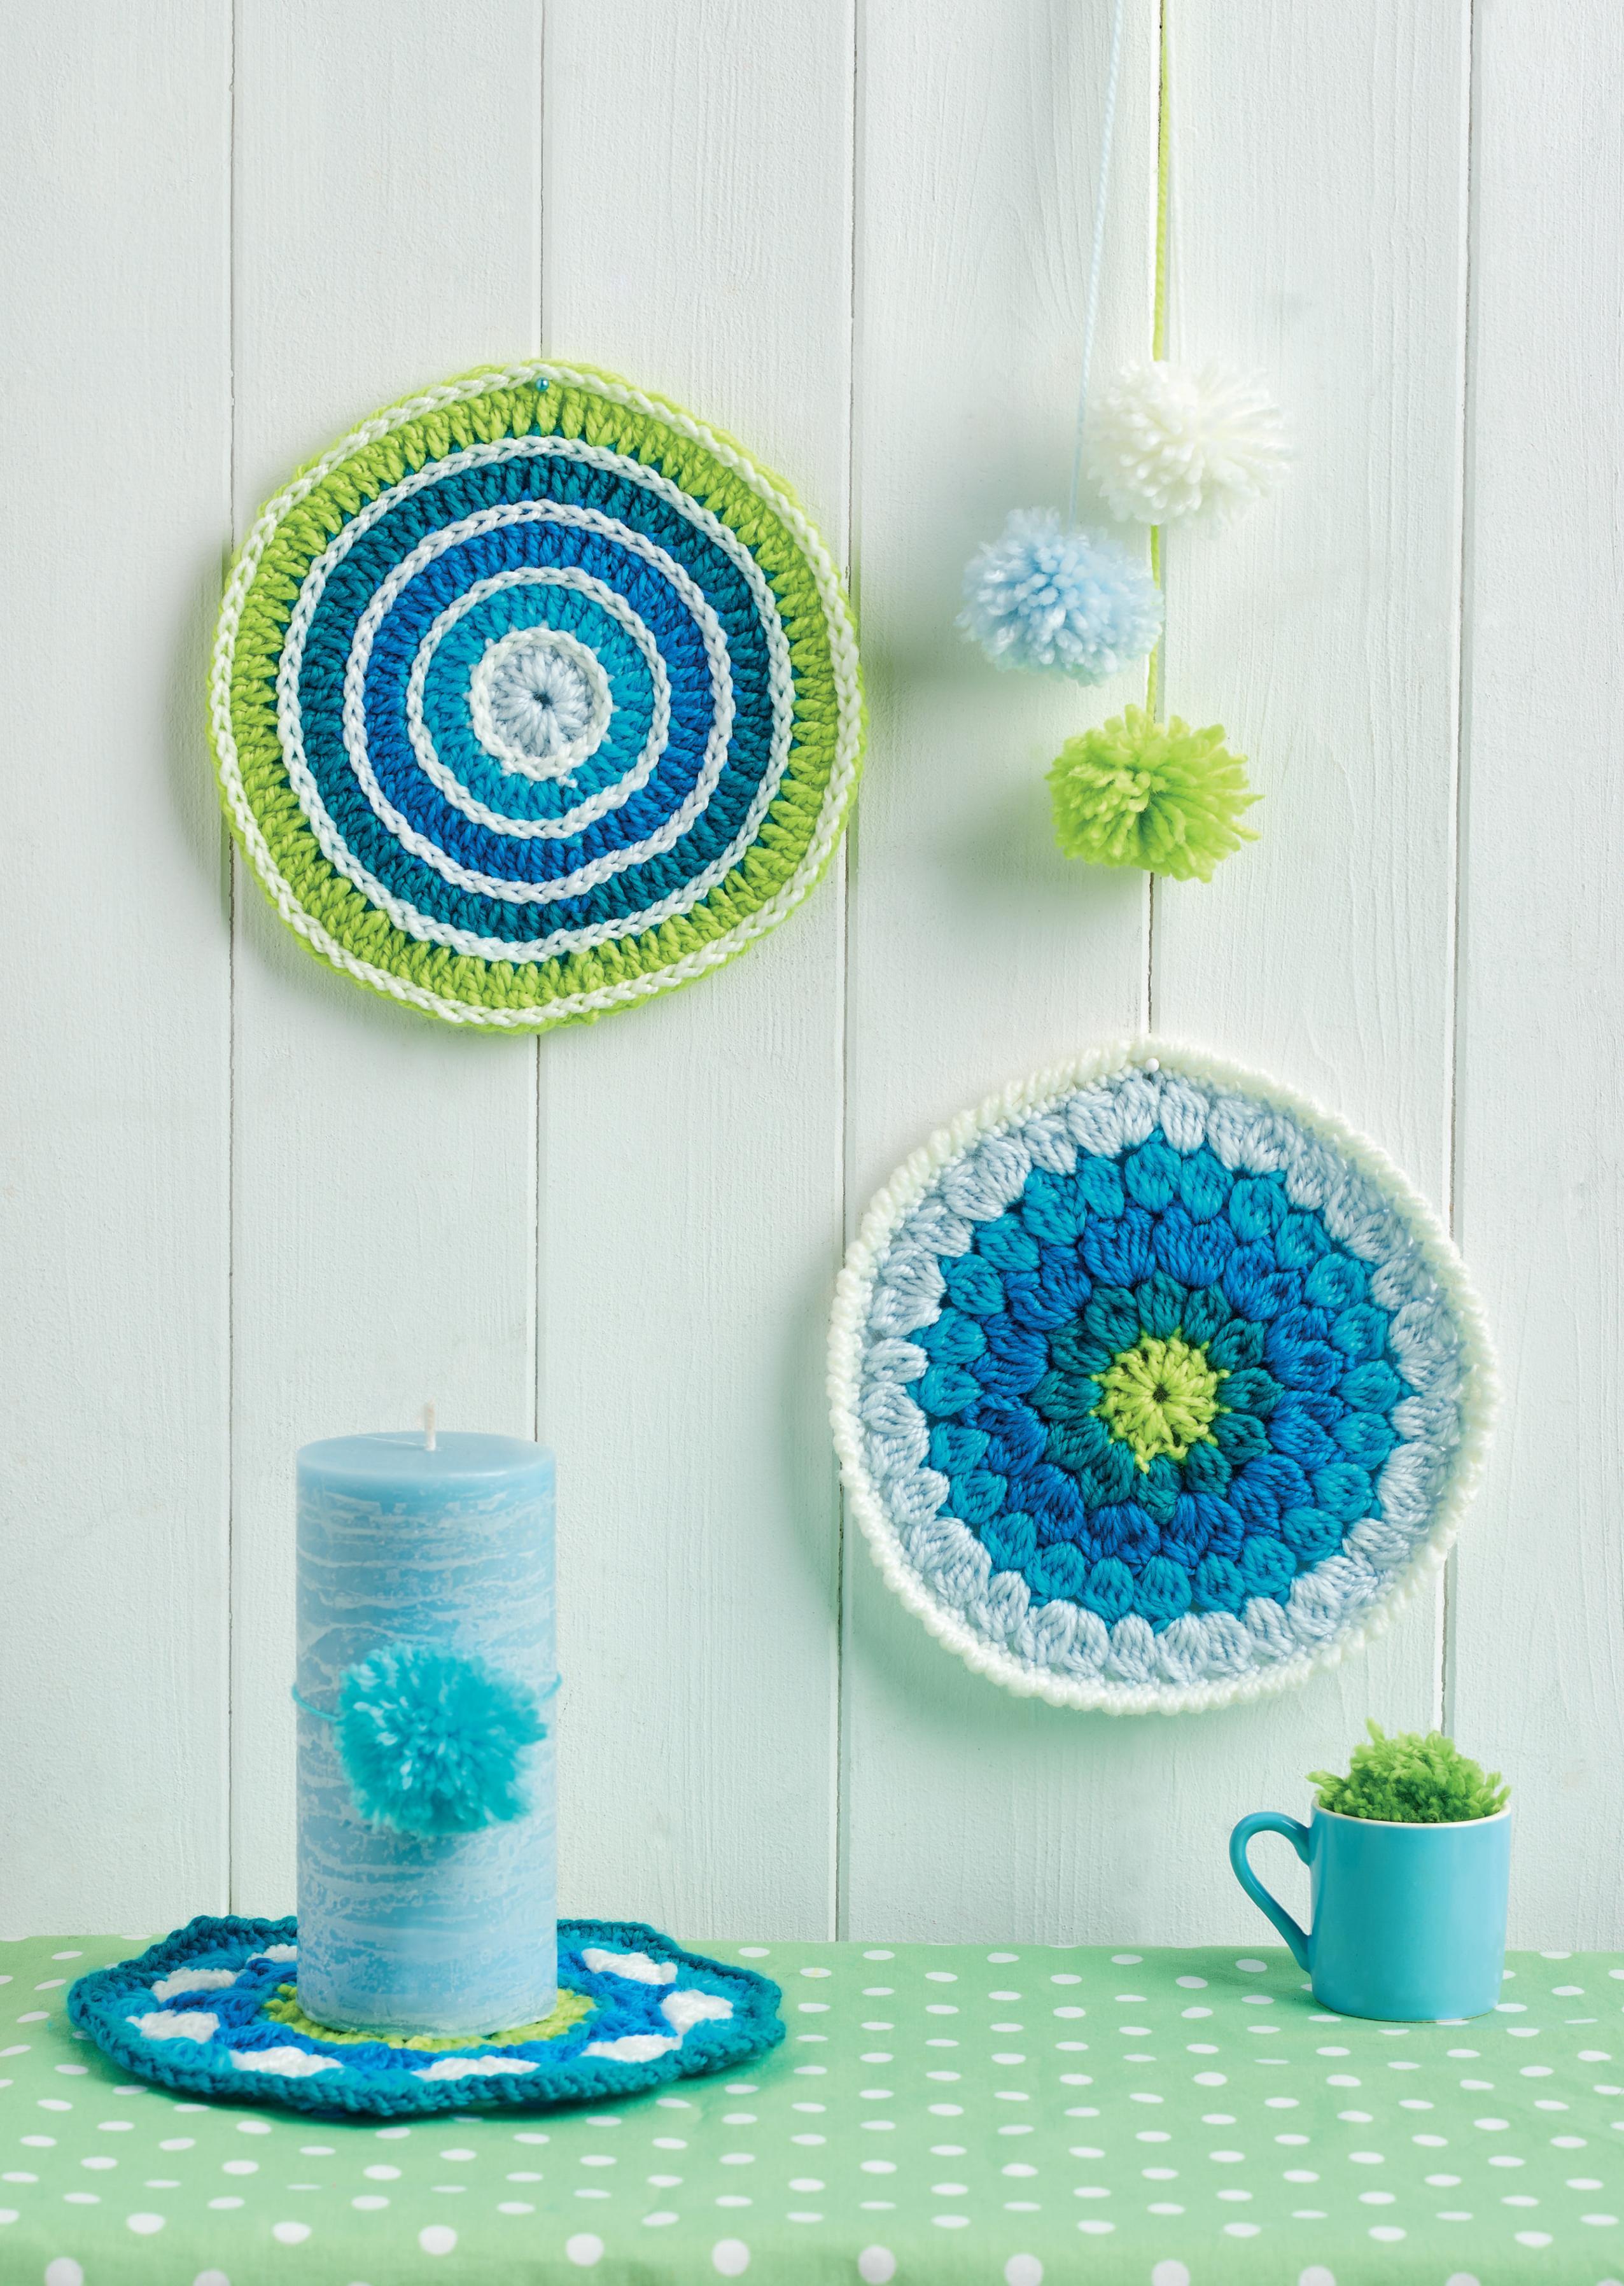 Circle Crochet Mandalas For Coasters Or Wall Art Crochet